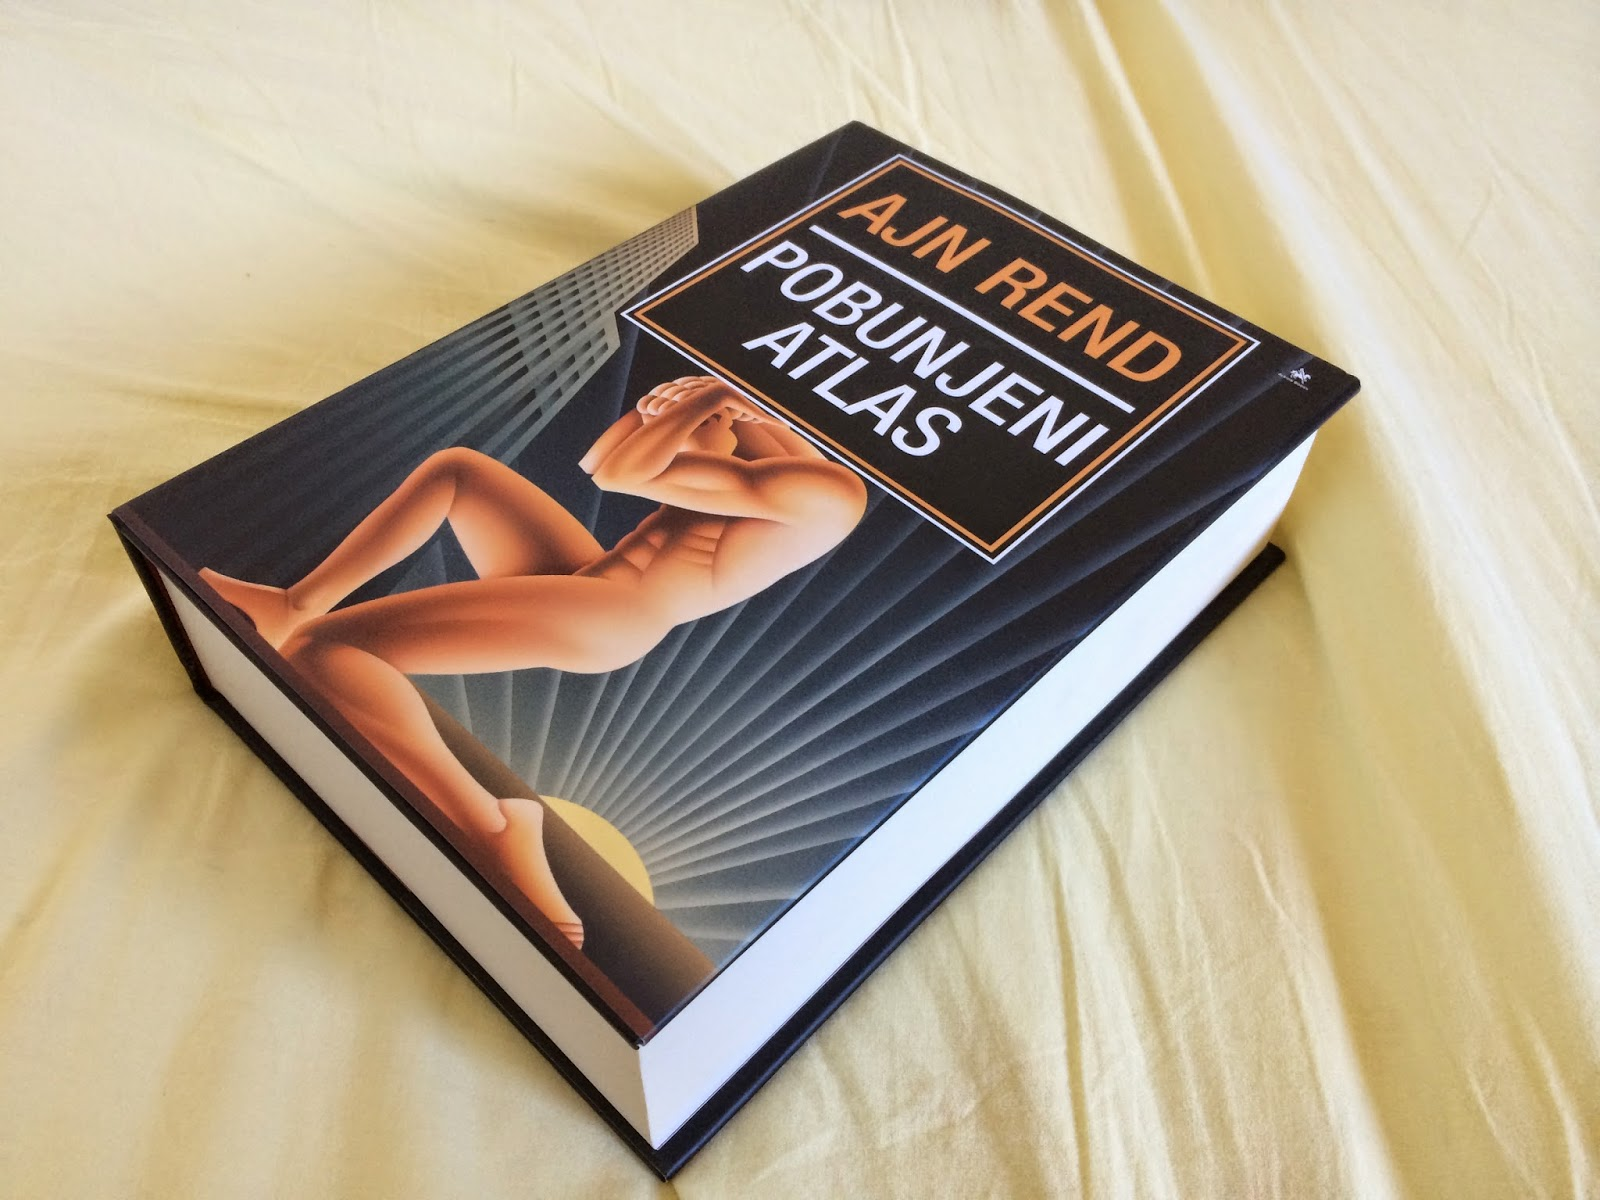 book a compendious grammar of the